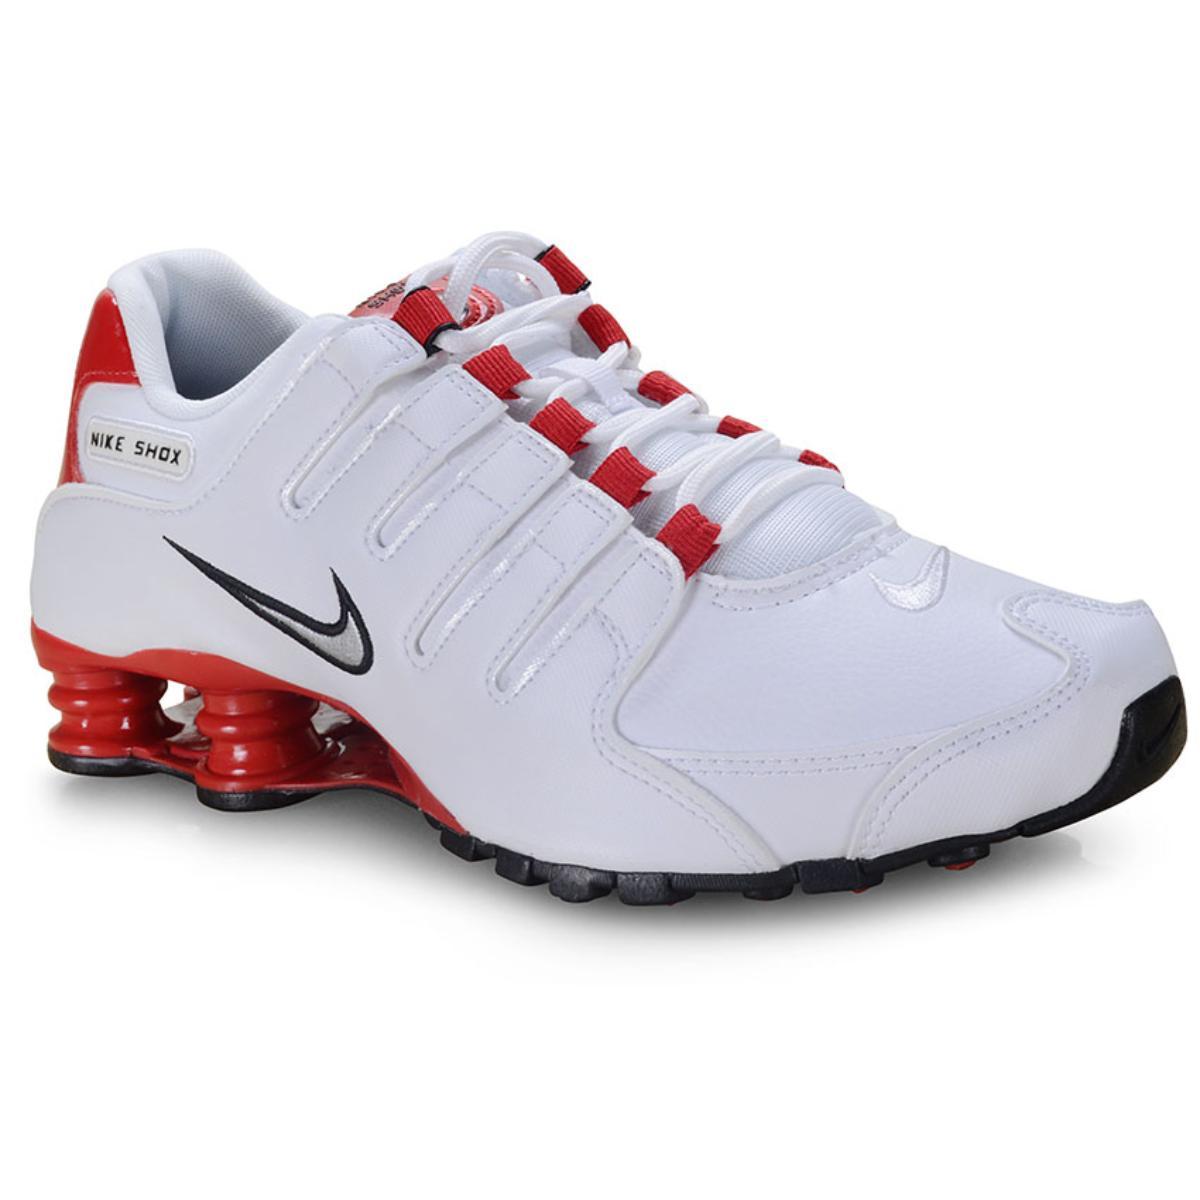 Tênis Masculino Nike 378341-110 Shox nz Branco/vermelho